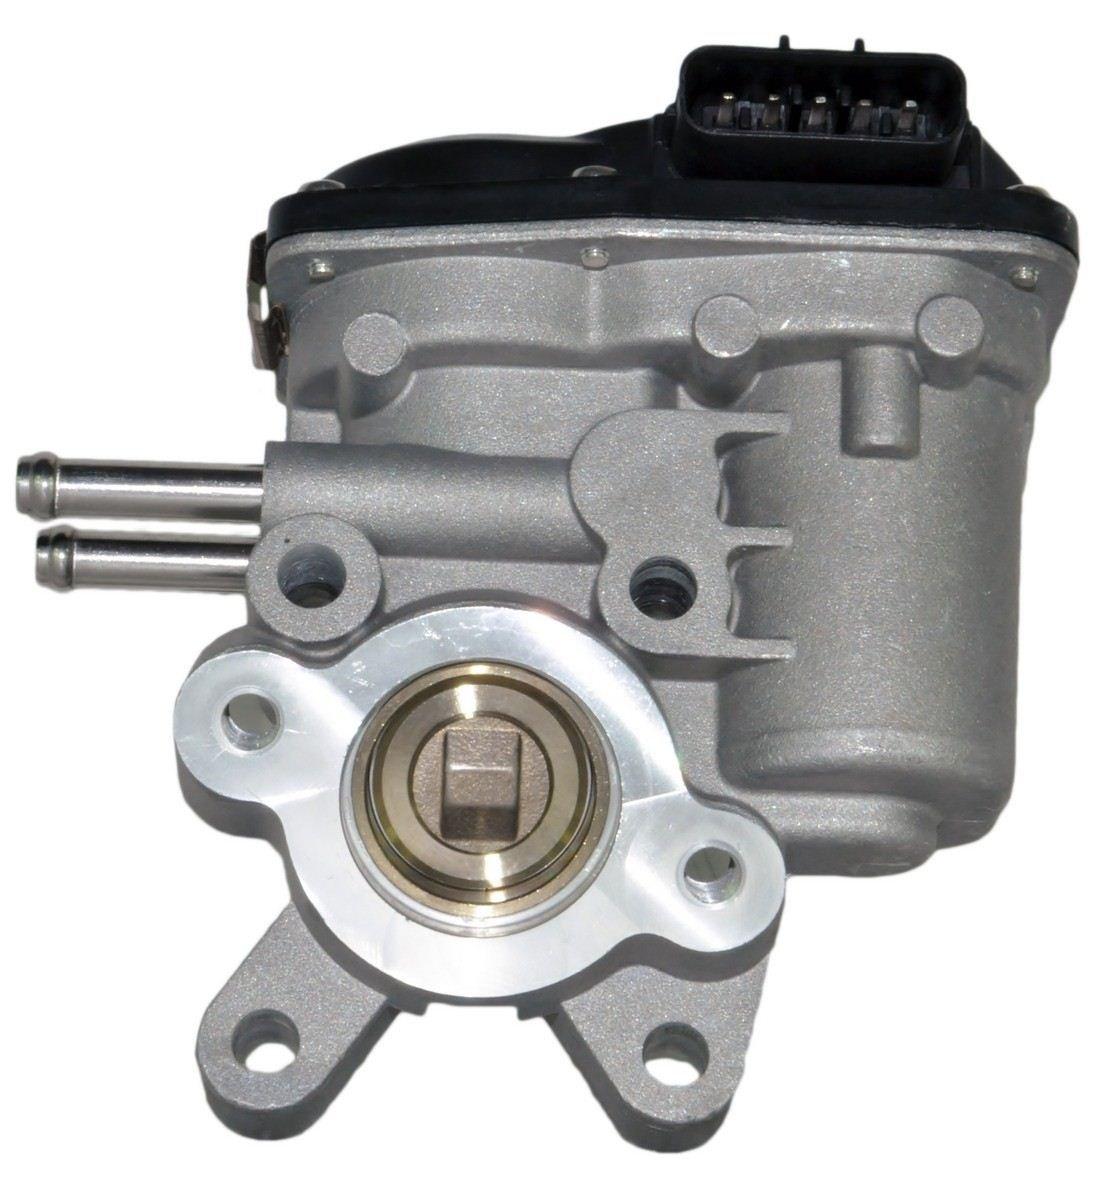 EGR Valve YD25 DCI For D40 Navara R51 Pathfinder 2.5 LTR Diesel 05-10 D2P